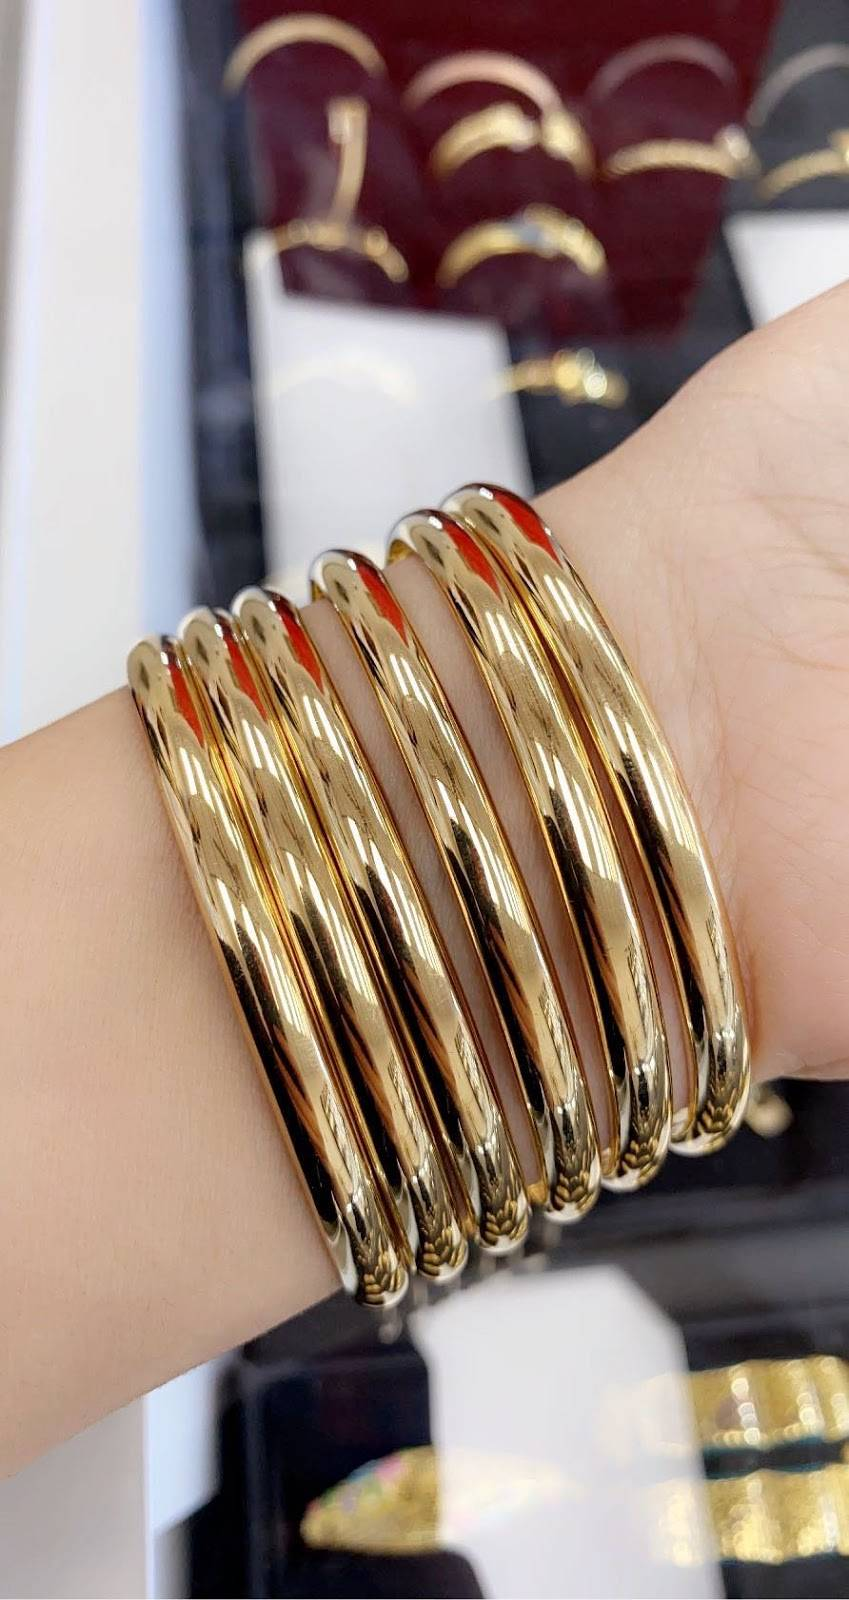 Queen jewelry - jewelry store  | Photo 5 of 10 | Address: 4064 E 14 Mile Rd, Warren, MI 48092, USA | Phone: (586) 303-2991